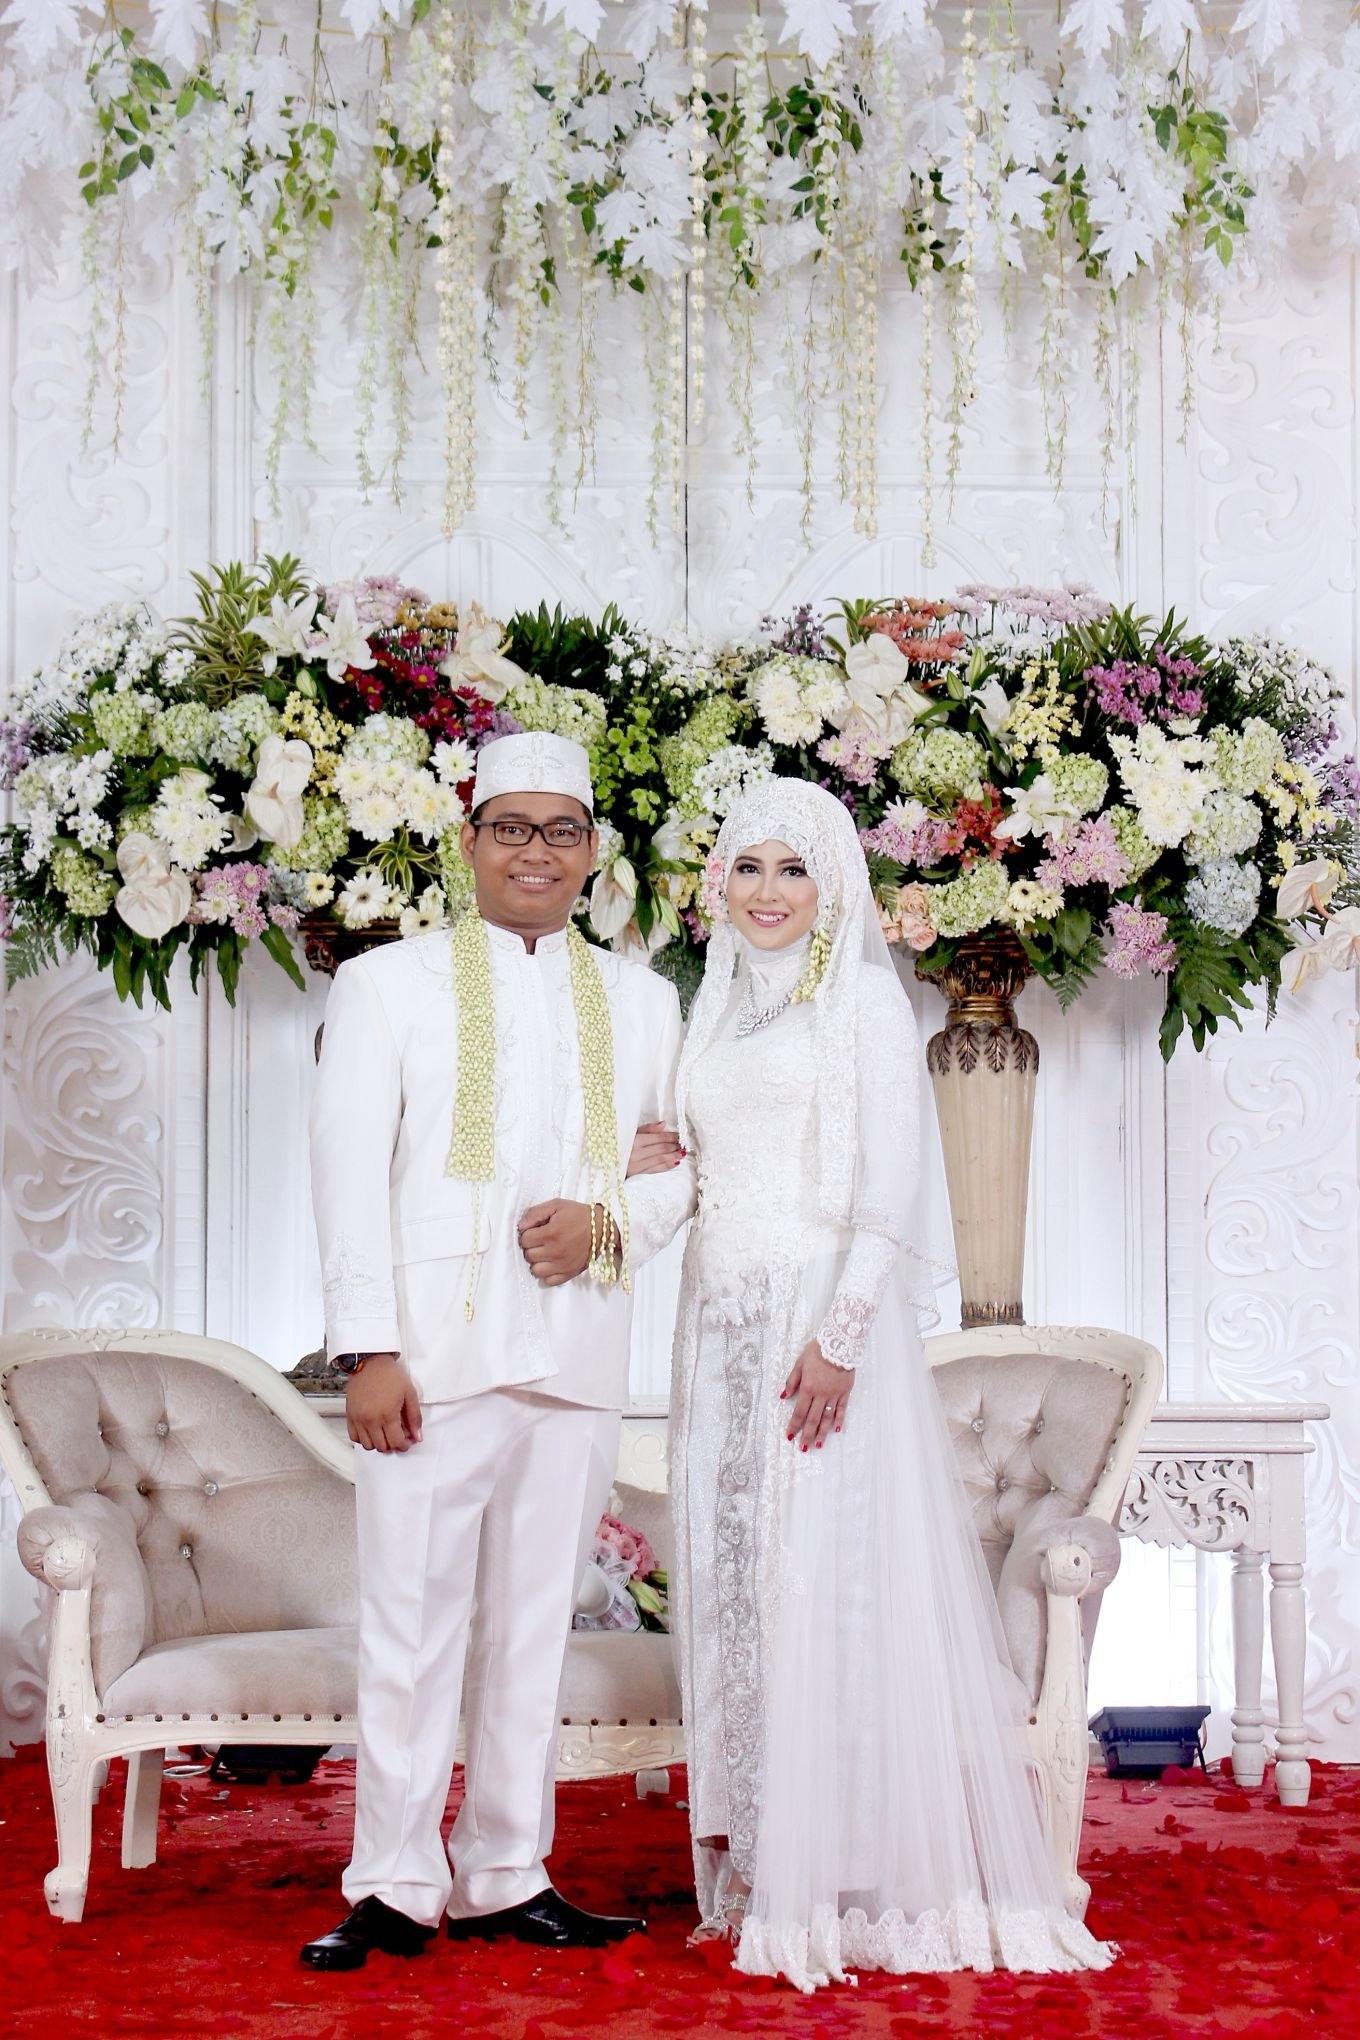 Ide Baju Pengantin Muslim Adat Jawa Zwd9 Ide Modis Baju Pengantin Muslim Adat Bugis